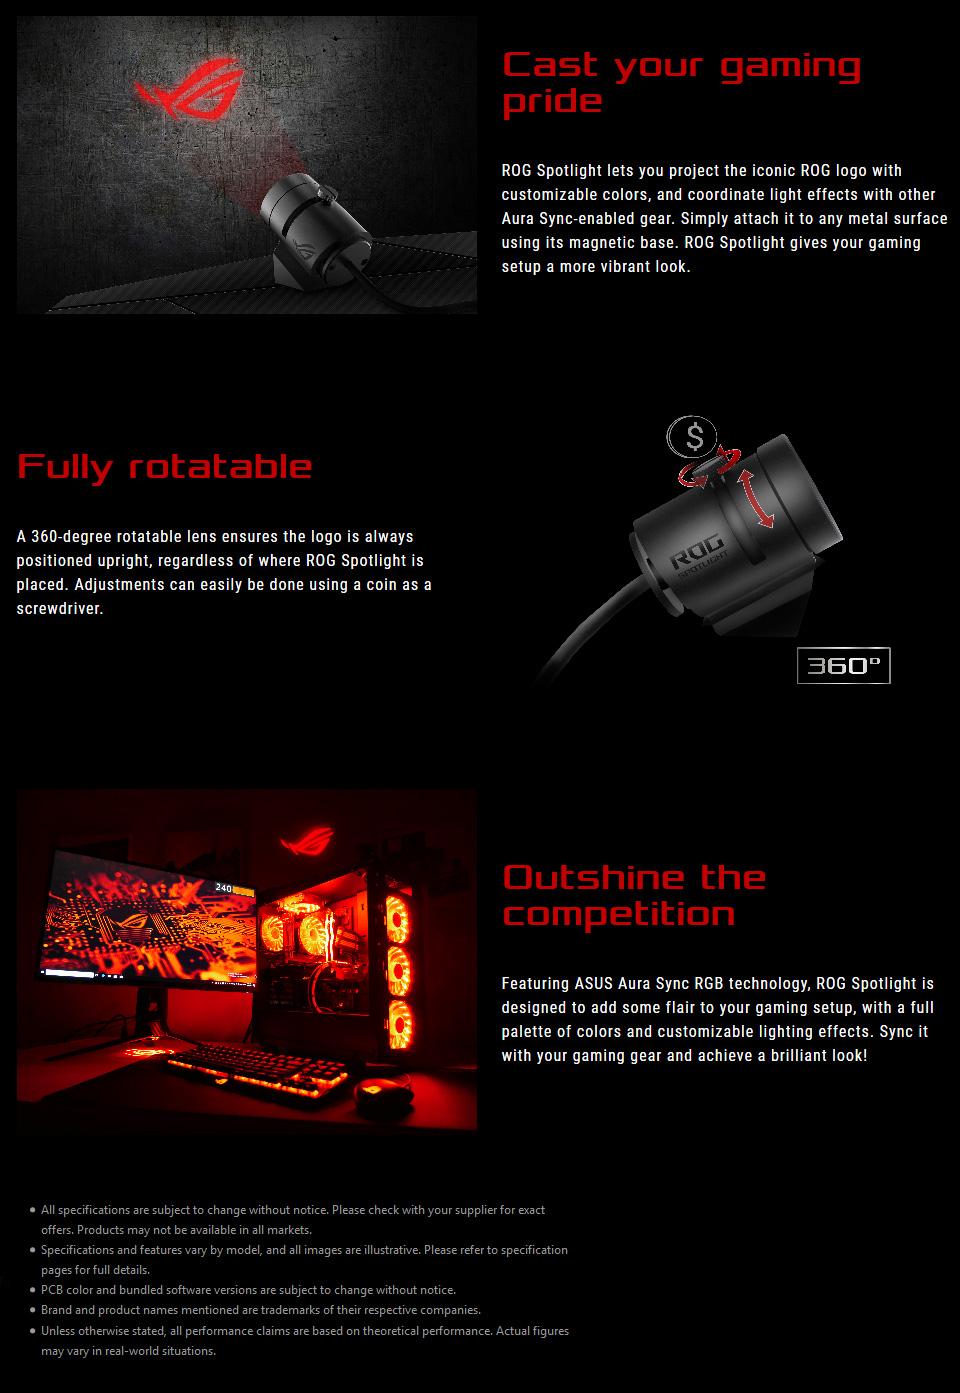 ASUS ROG Aura Sync RGB Spotlight